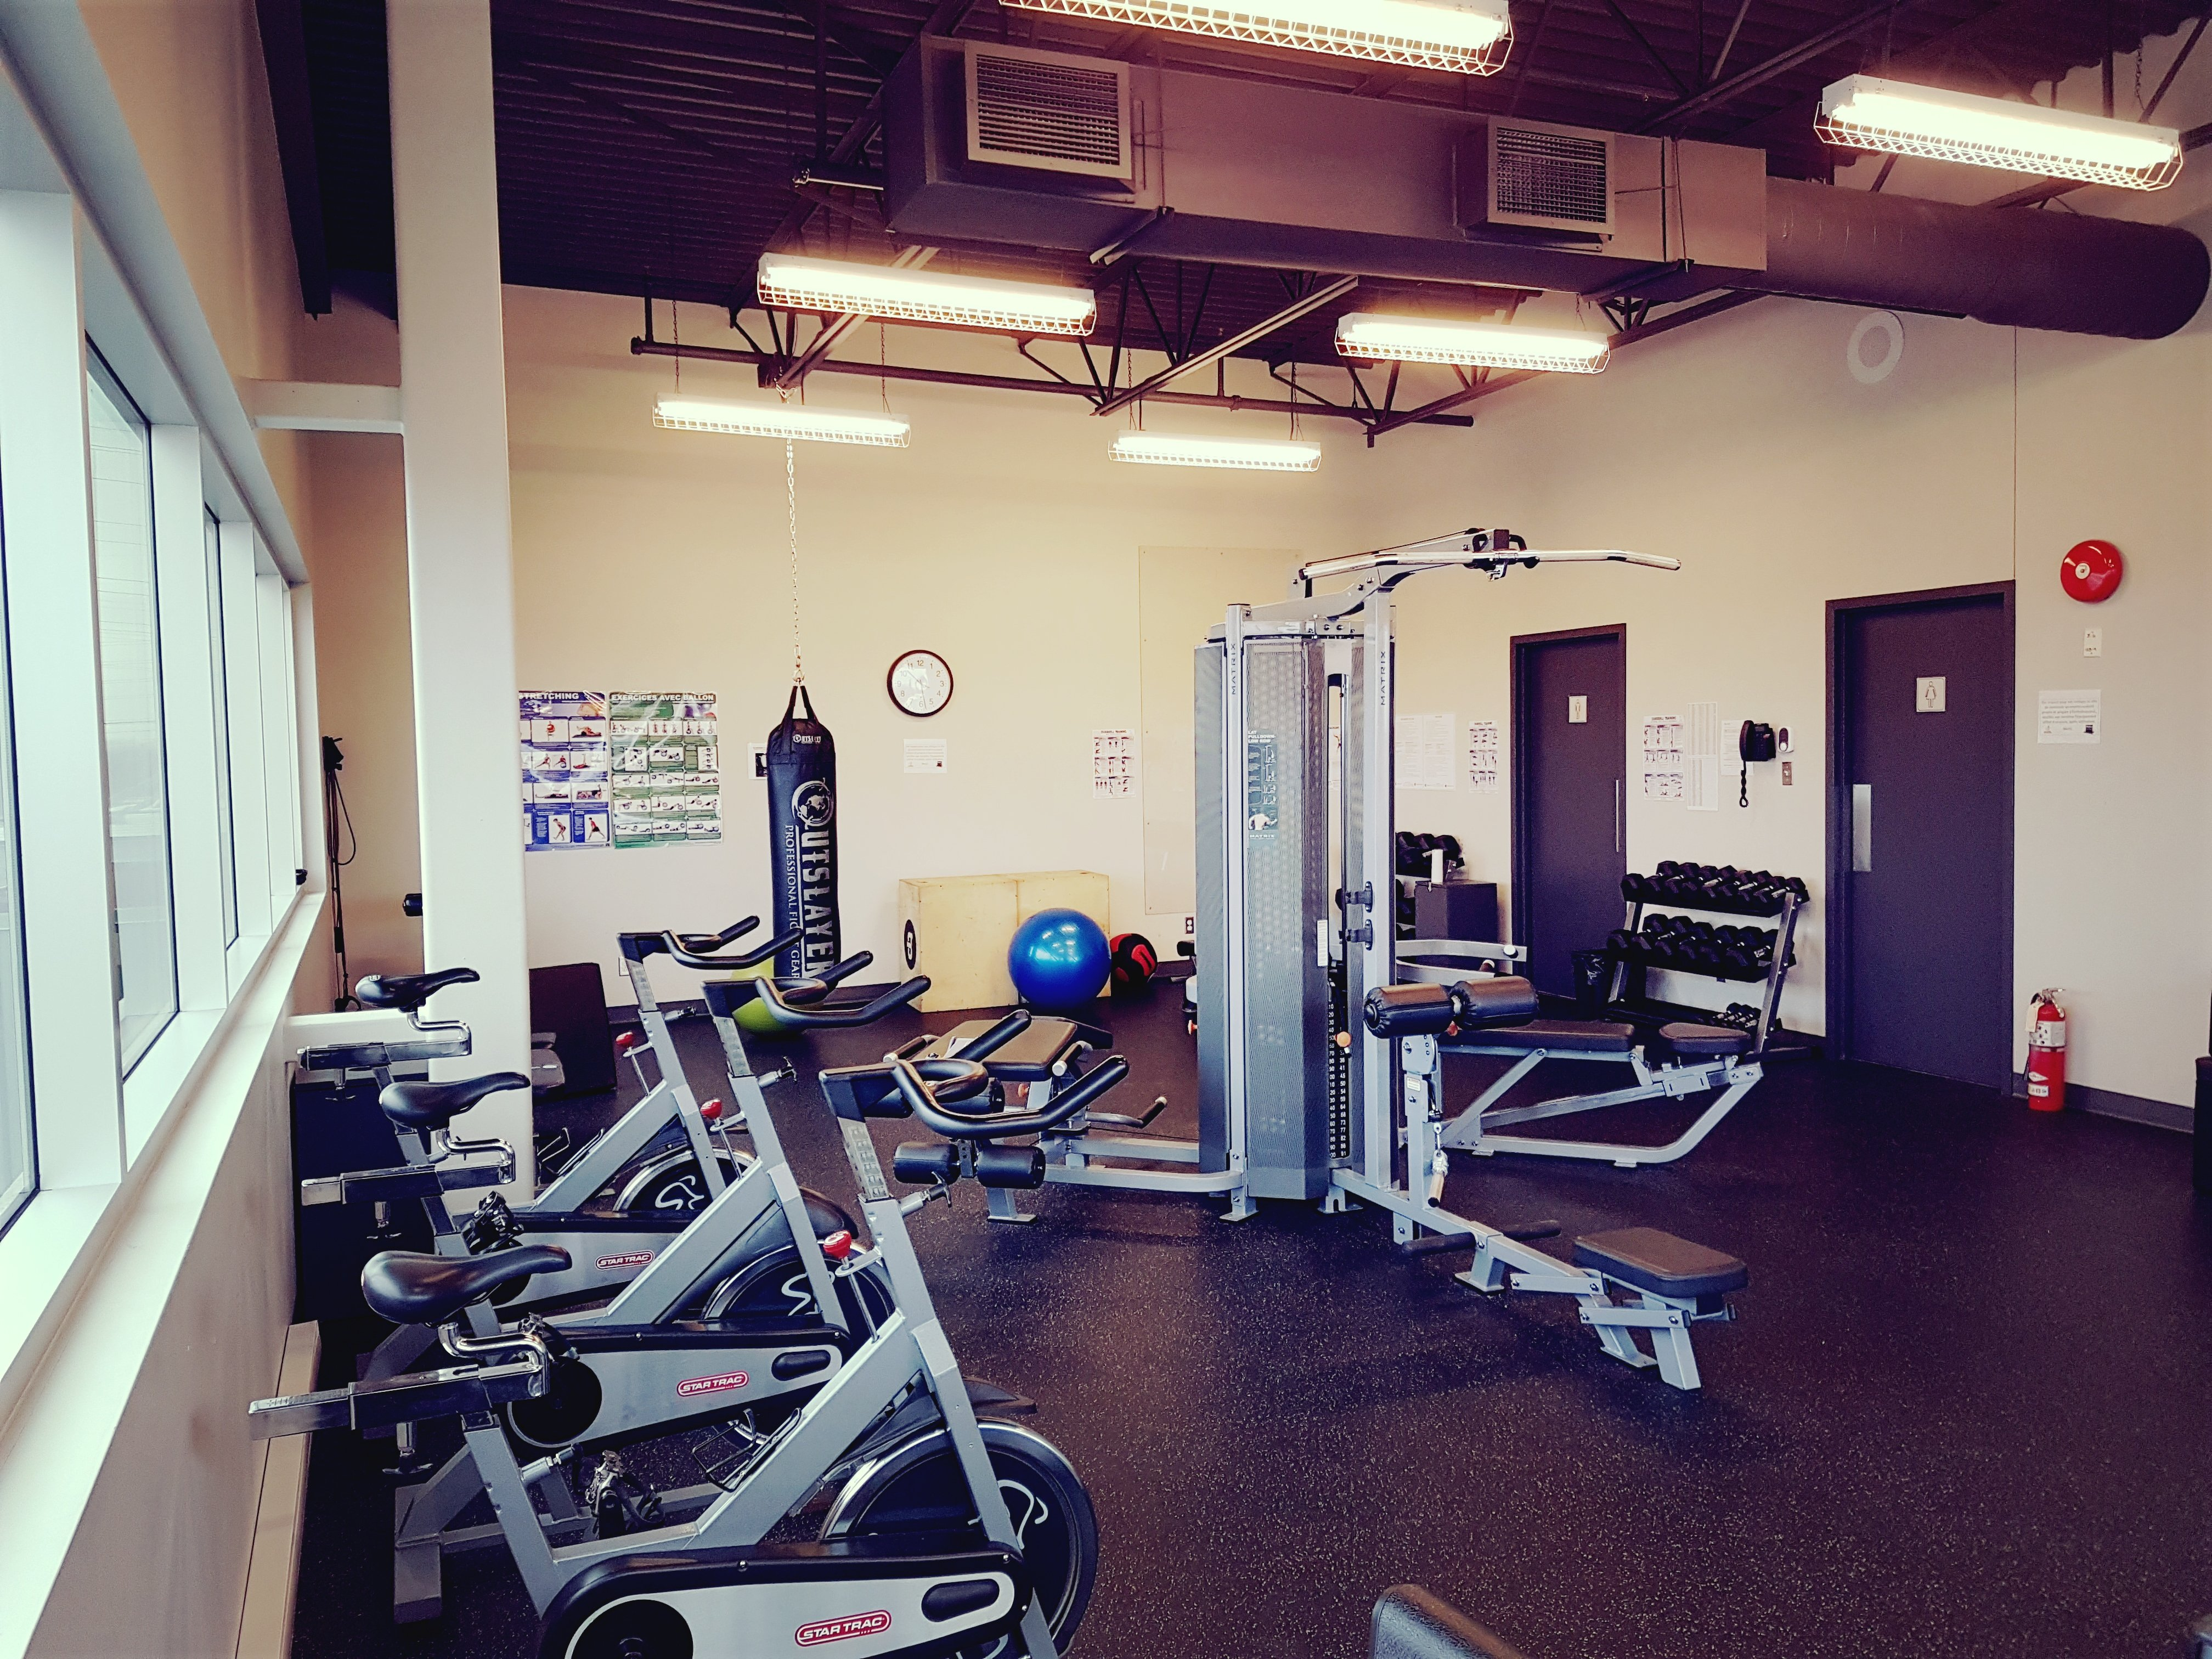 Gym room dbm optix